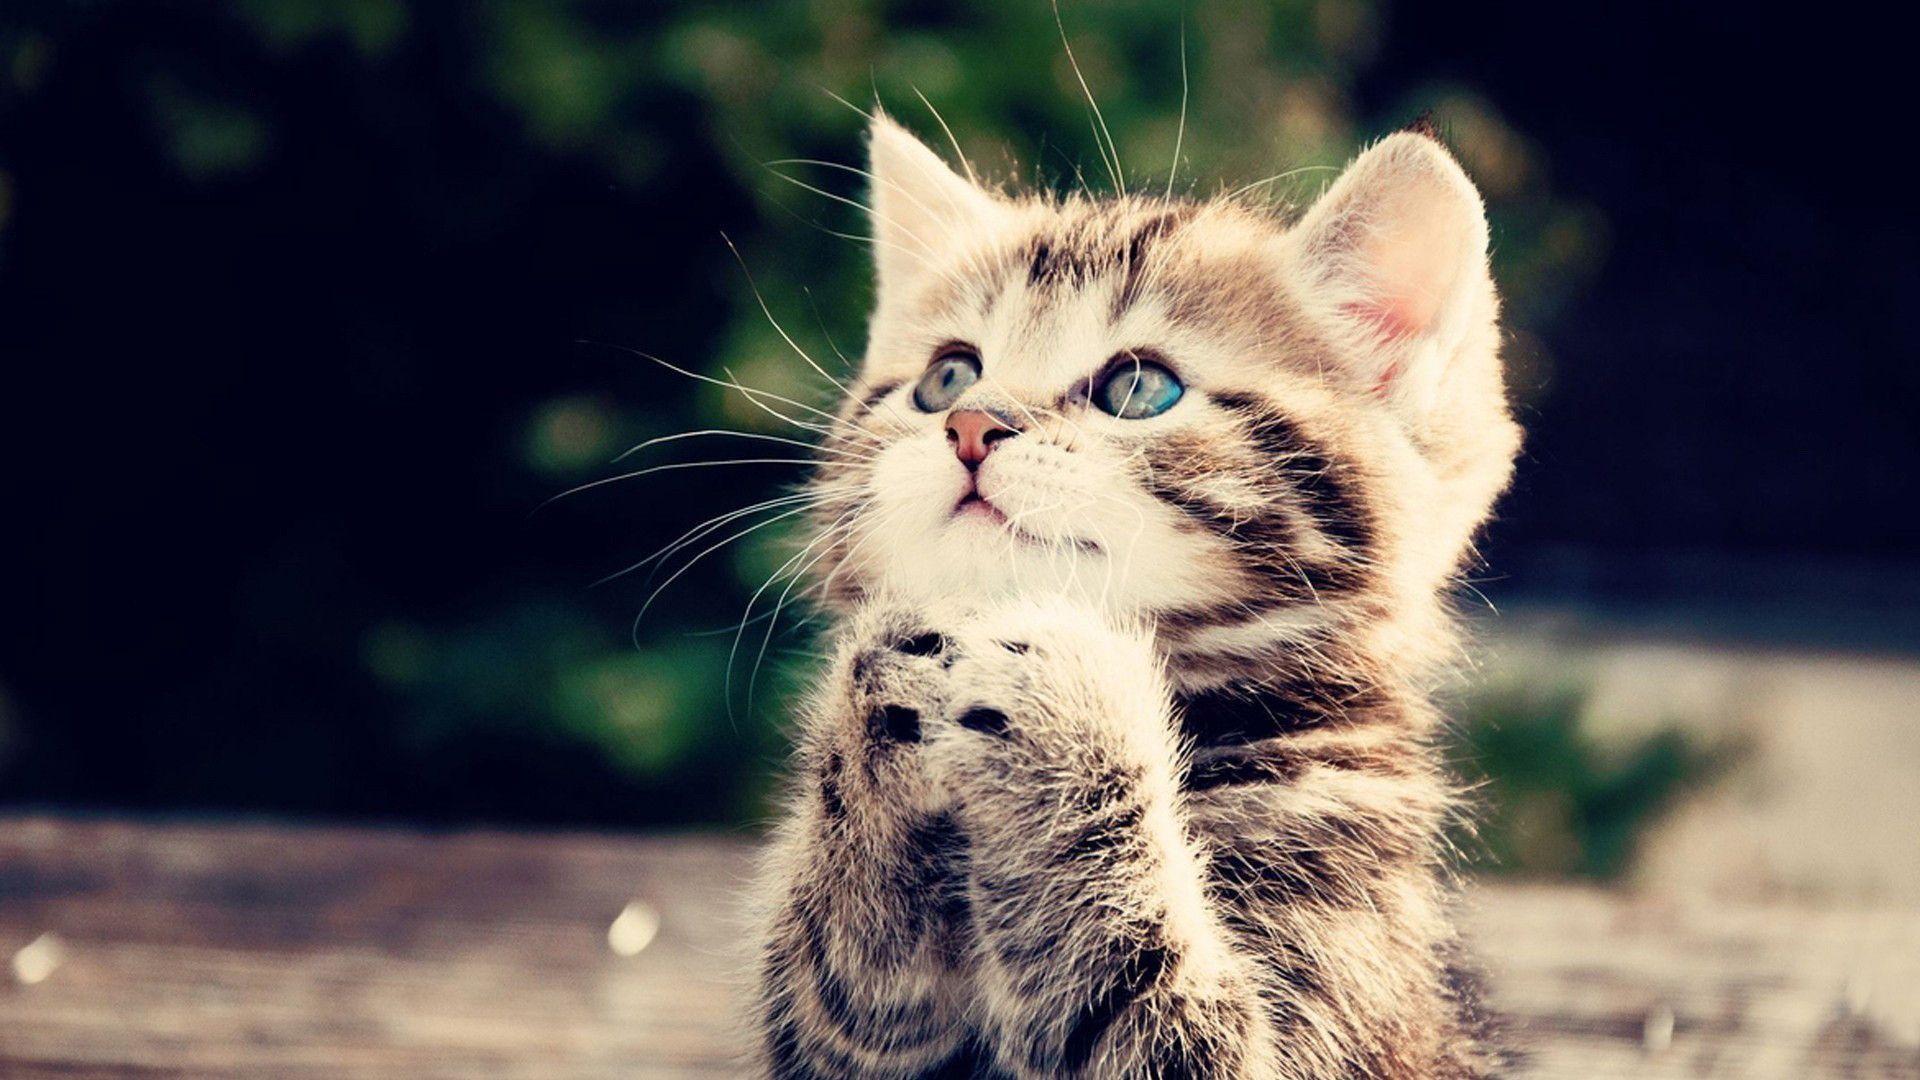 Cute Kitten Wallpaper - Cute Animals Hd - HD Wallpaper